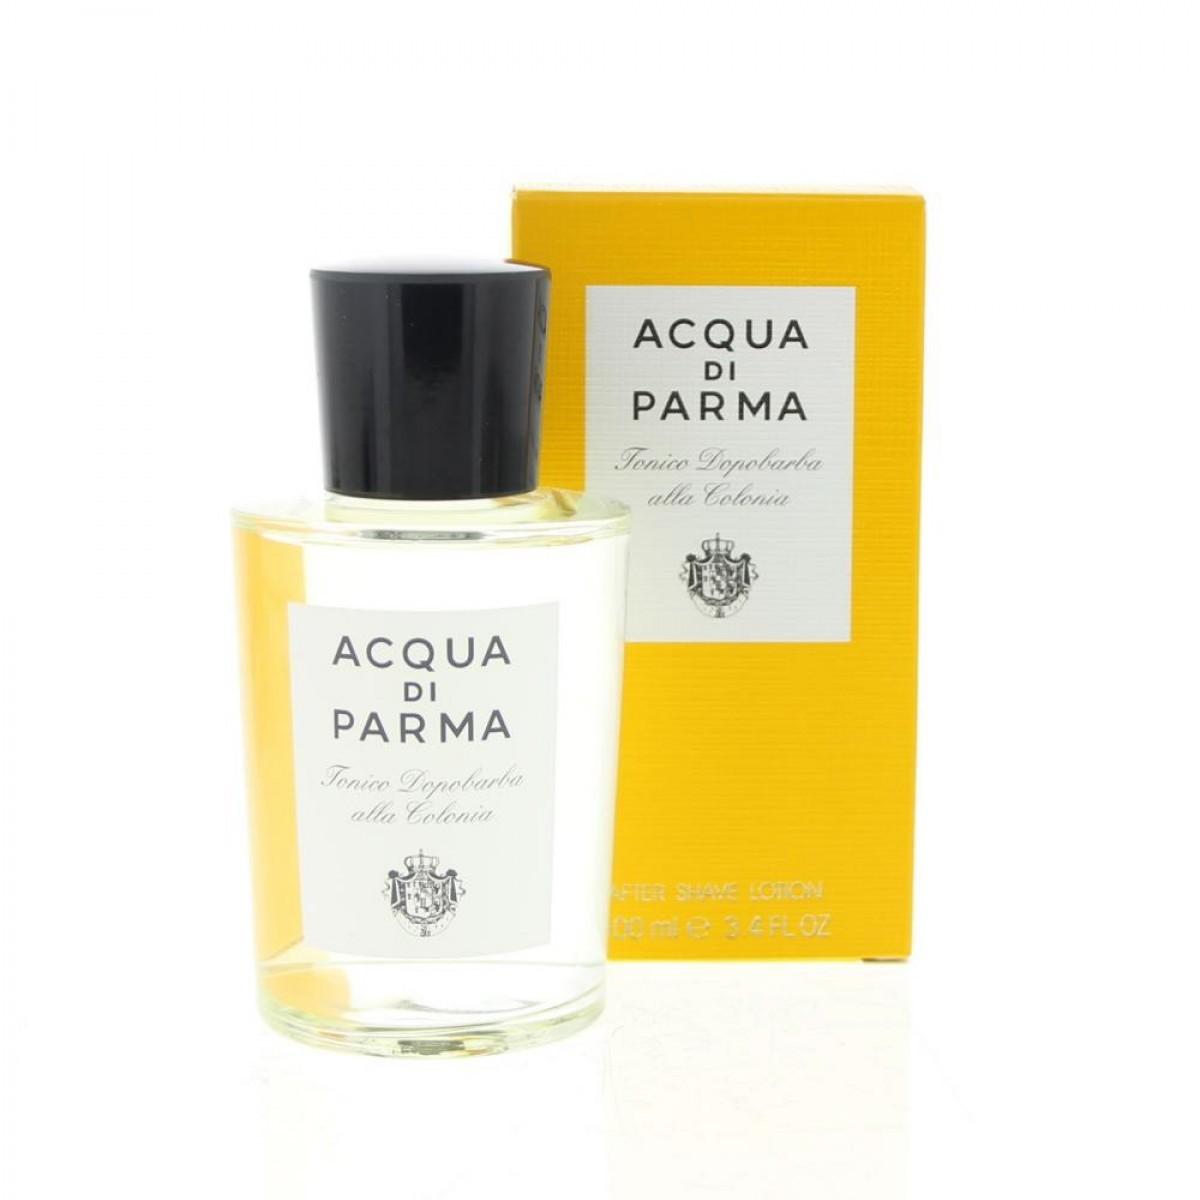 Acqua Di Parma アクア ディ パルマ コロニア アフター シェーブ ローション Colonia Aftershave Lotion 100ml